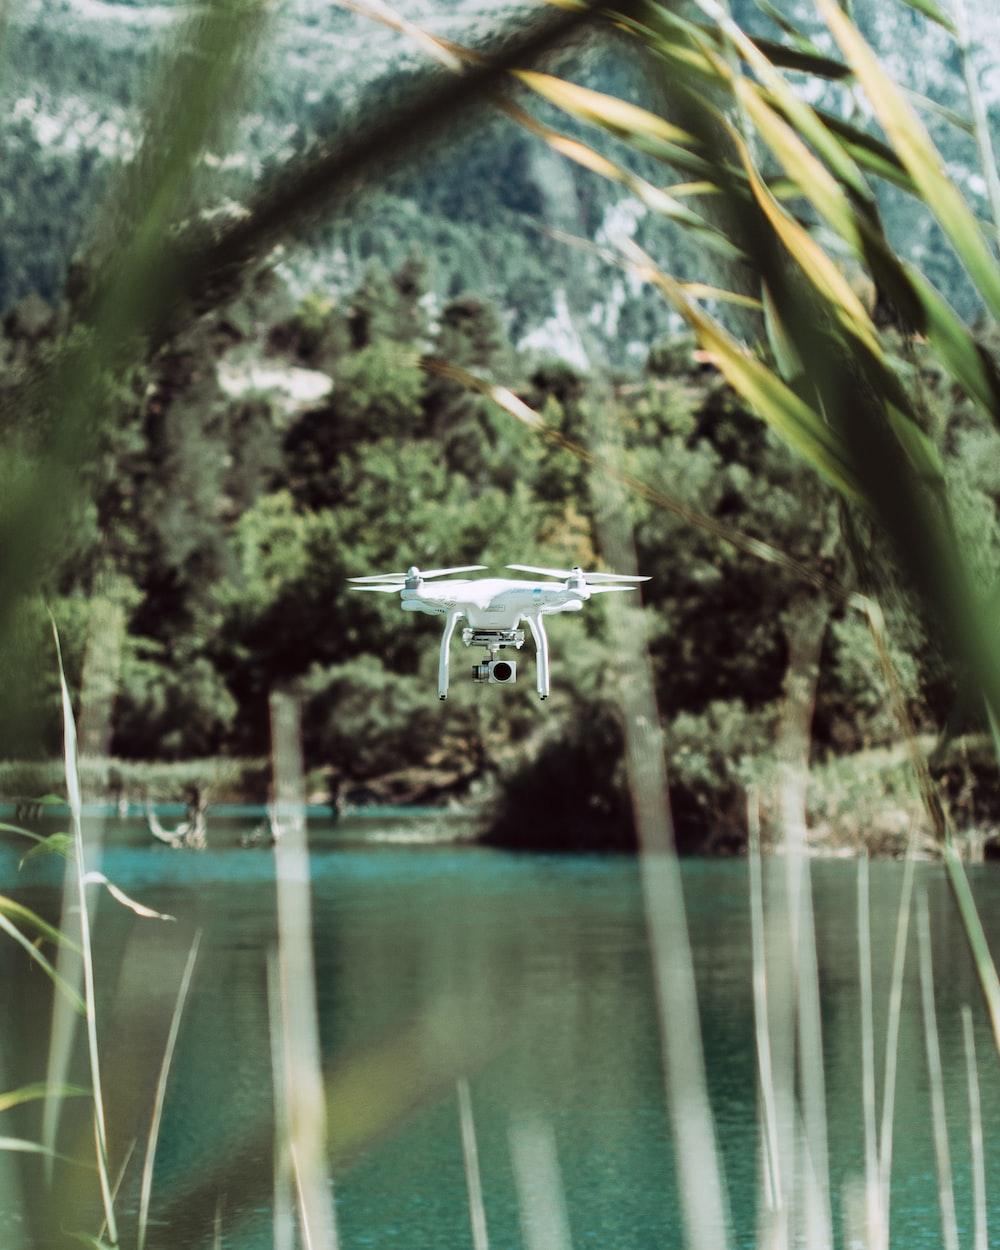 DJI Phantom 4 drone flying near body of water